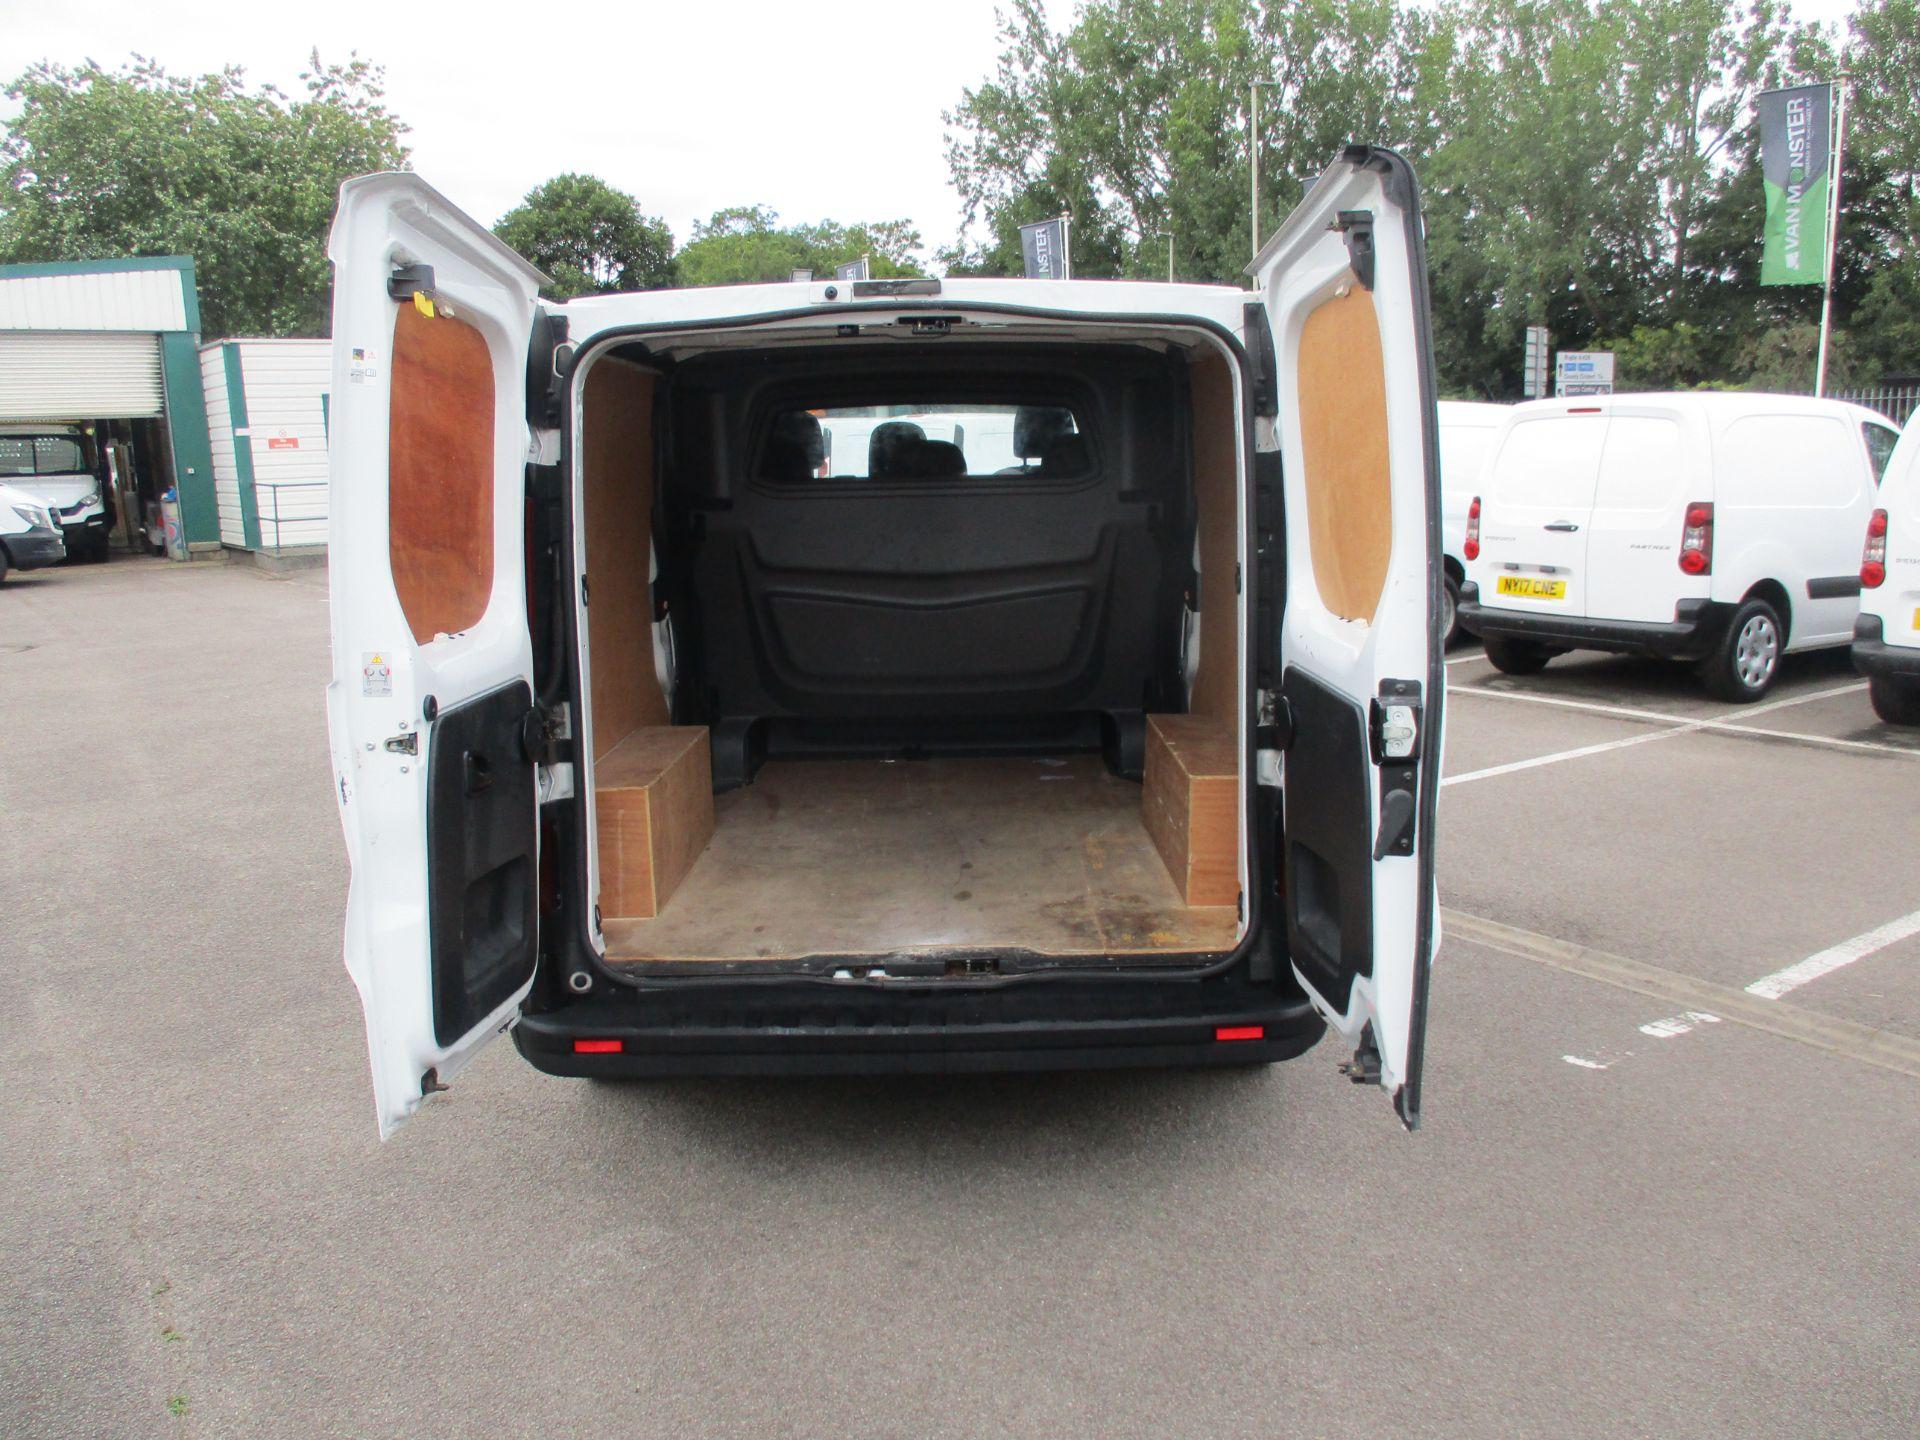 2017 Vauxhall Vivaro L2 H1 2900 1.6CDTI 120PS DOUBLE CAB  EURO 6 (DY67MYF) Image 6